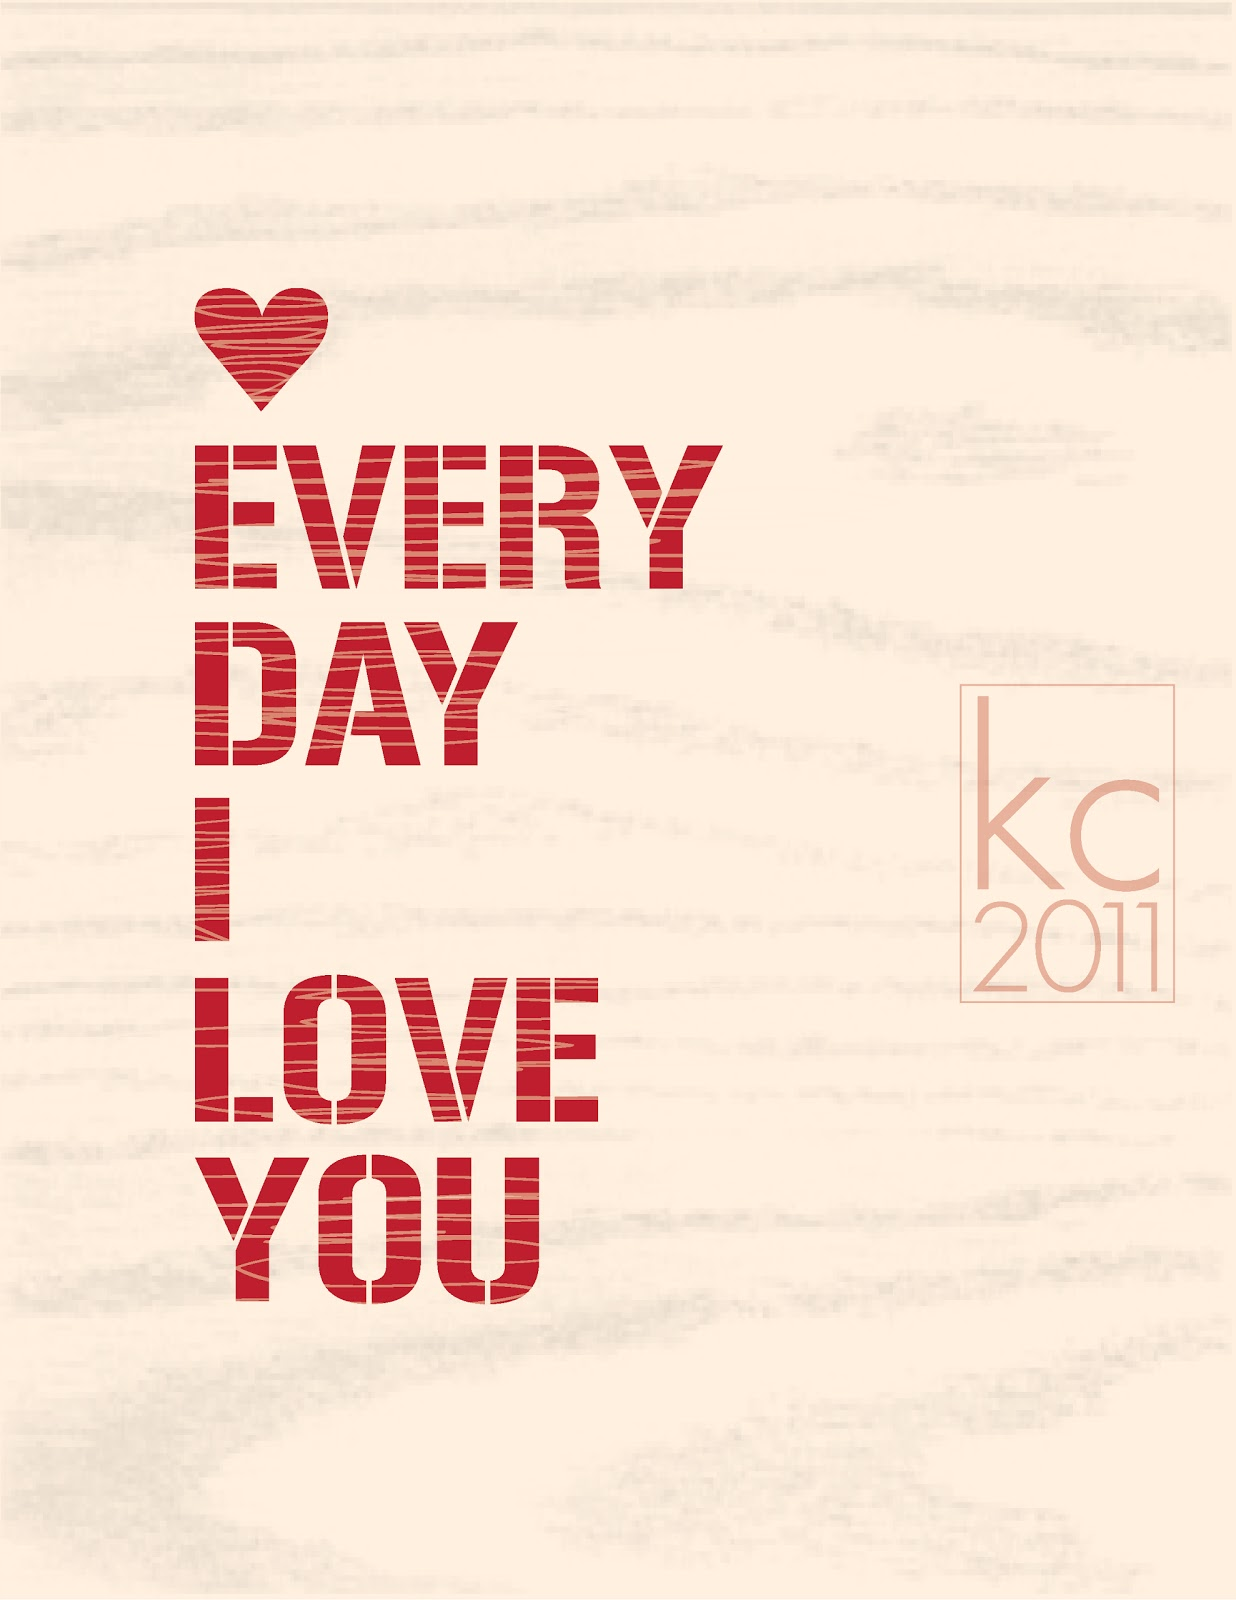 http://3.bp.blogspot.com/_VY0iaSojtkU/TSTcIESzNKI/AAAAAAAAGRQ/T0_d4FsyYWk/s1600/every+day+i+love+you.jpg